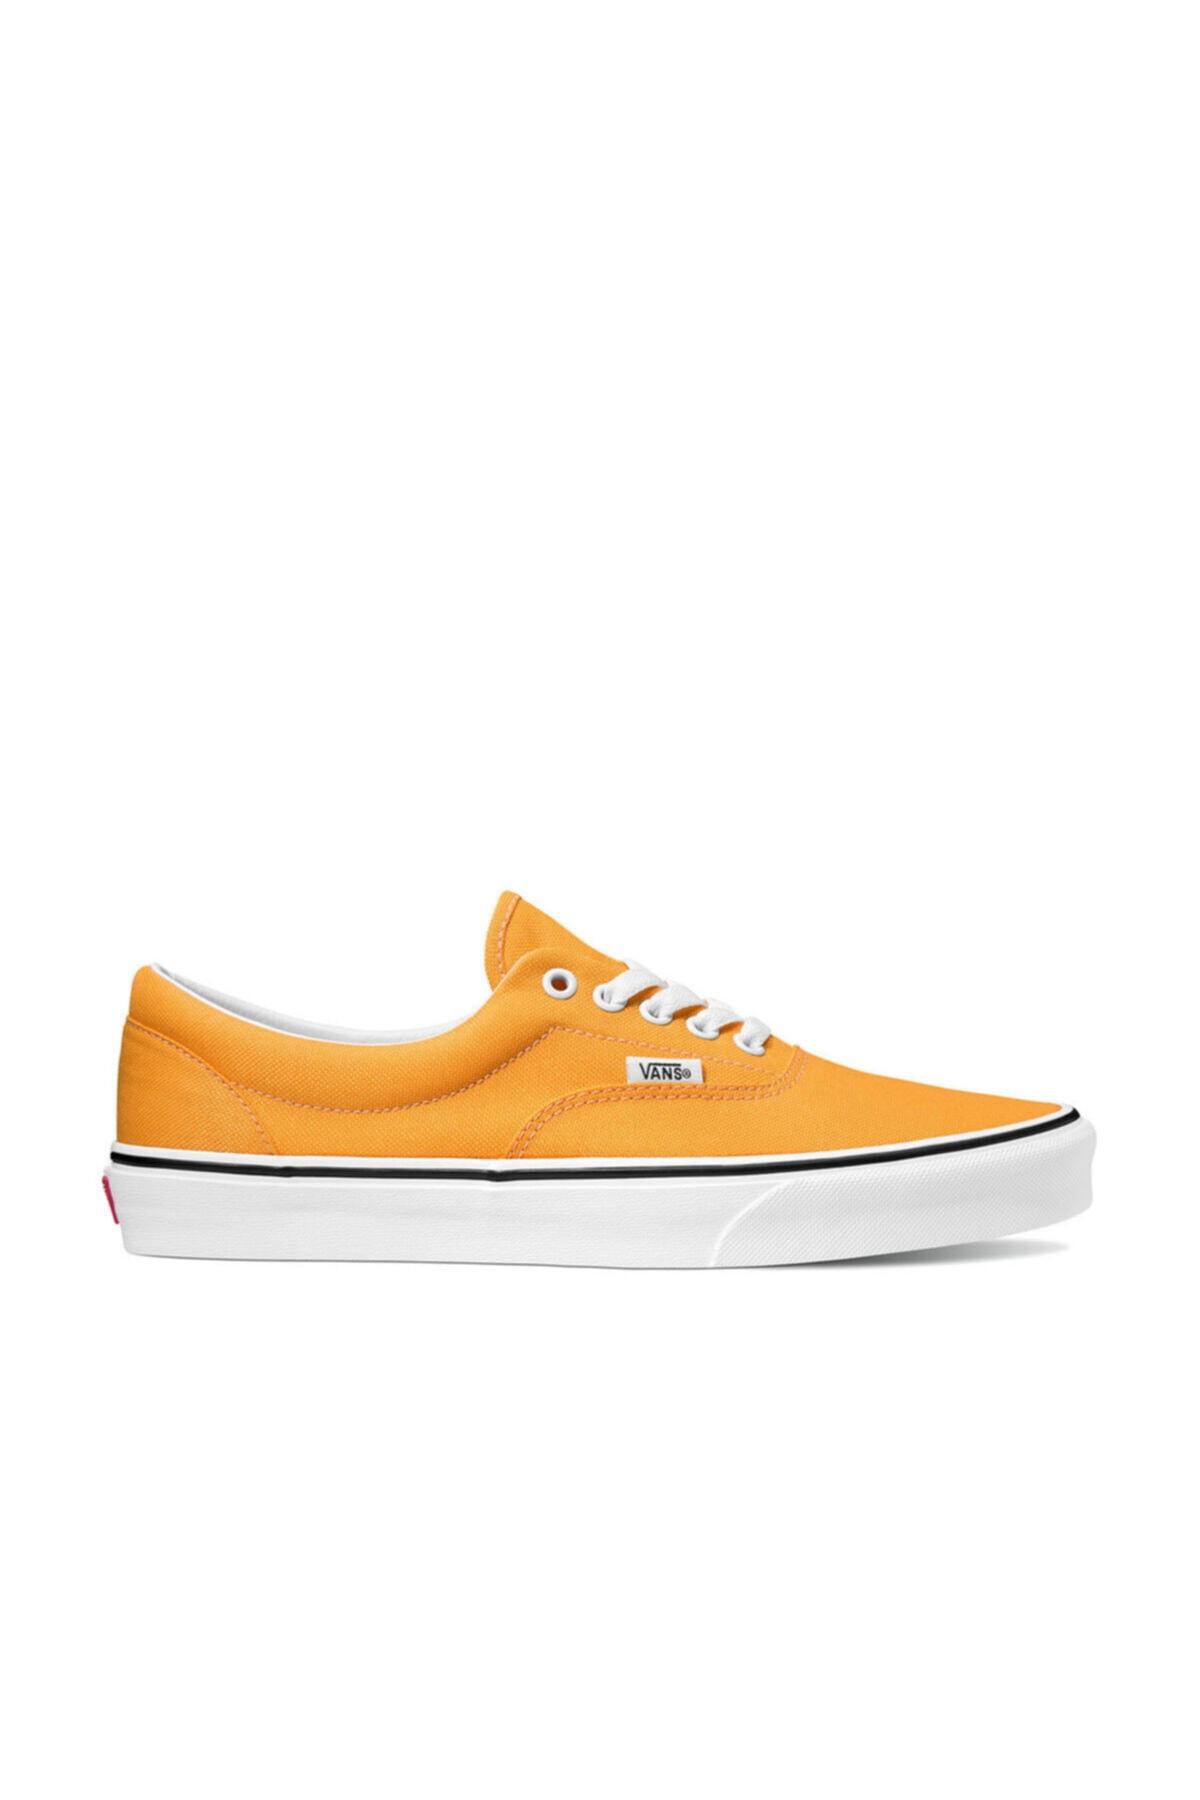 Vans UA ERA Turuncu Erkek Sneaker Ayakkabı 100583594 1